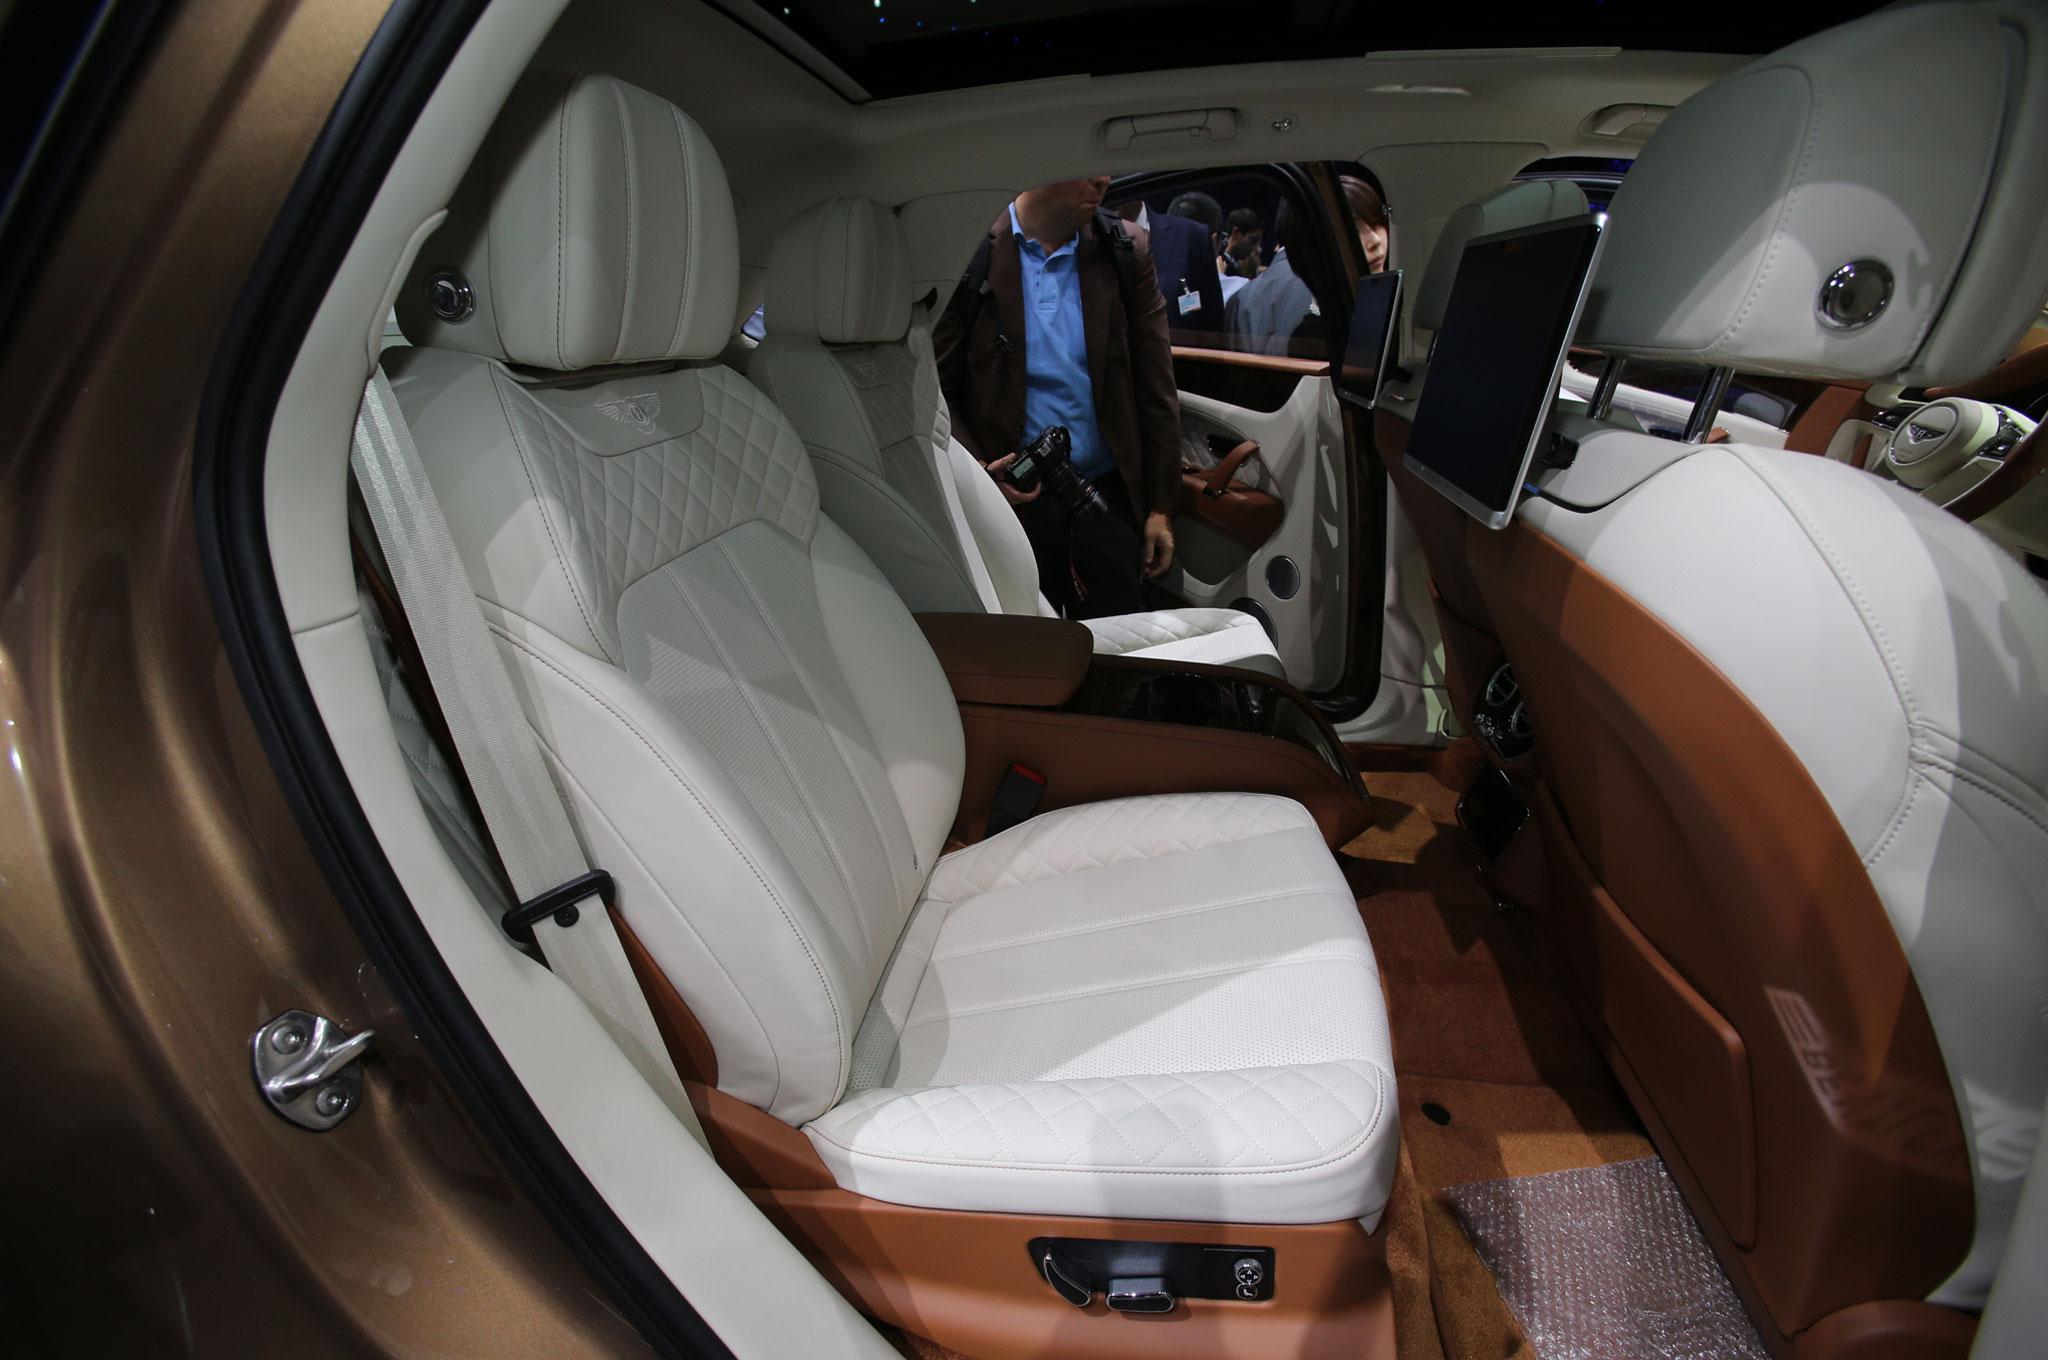 2017 7 Passenger Suv >> 2017 Bentley Bentayga SUV Revealed Ahead of Frankfurt